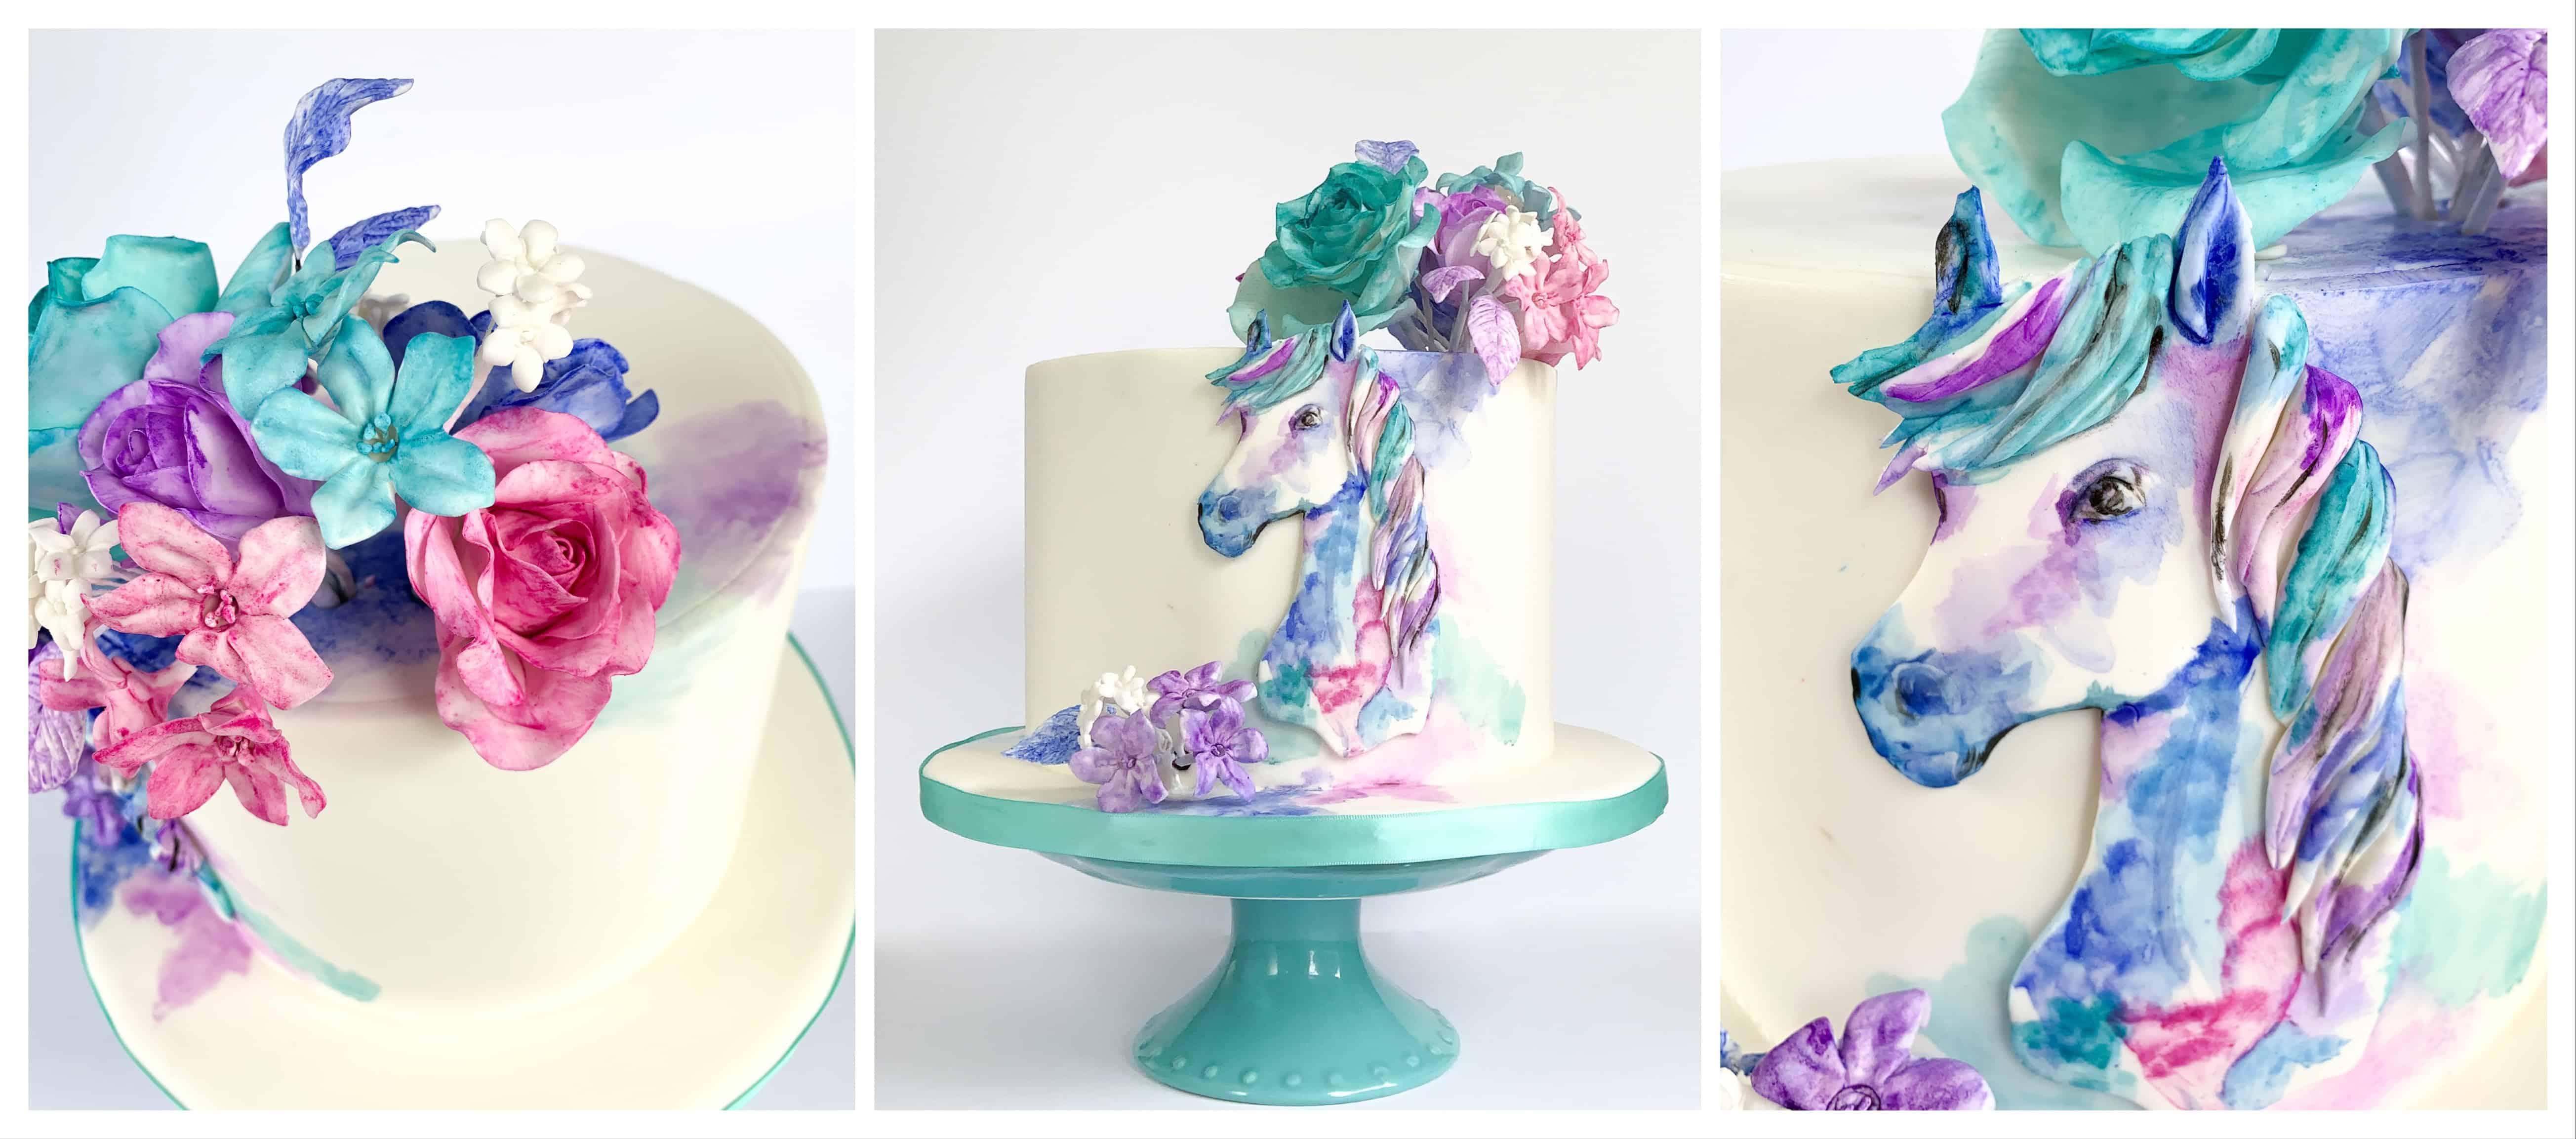 The Makery Cake Company Painted Horse Cake